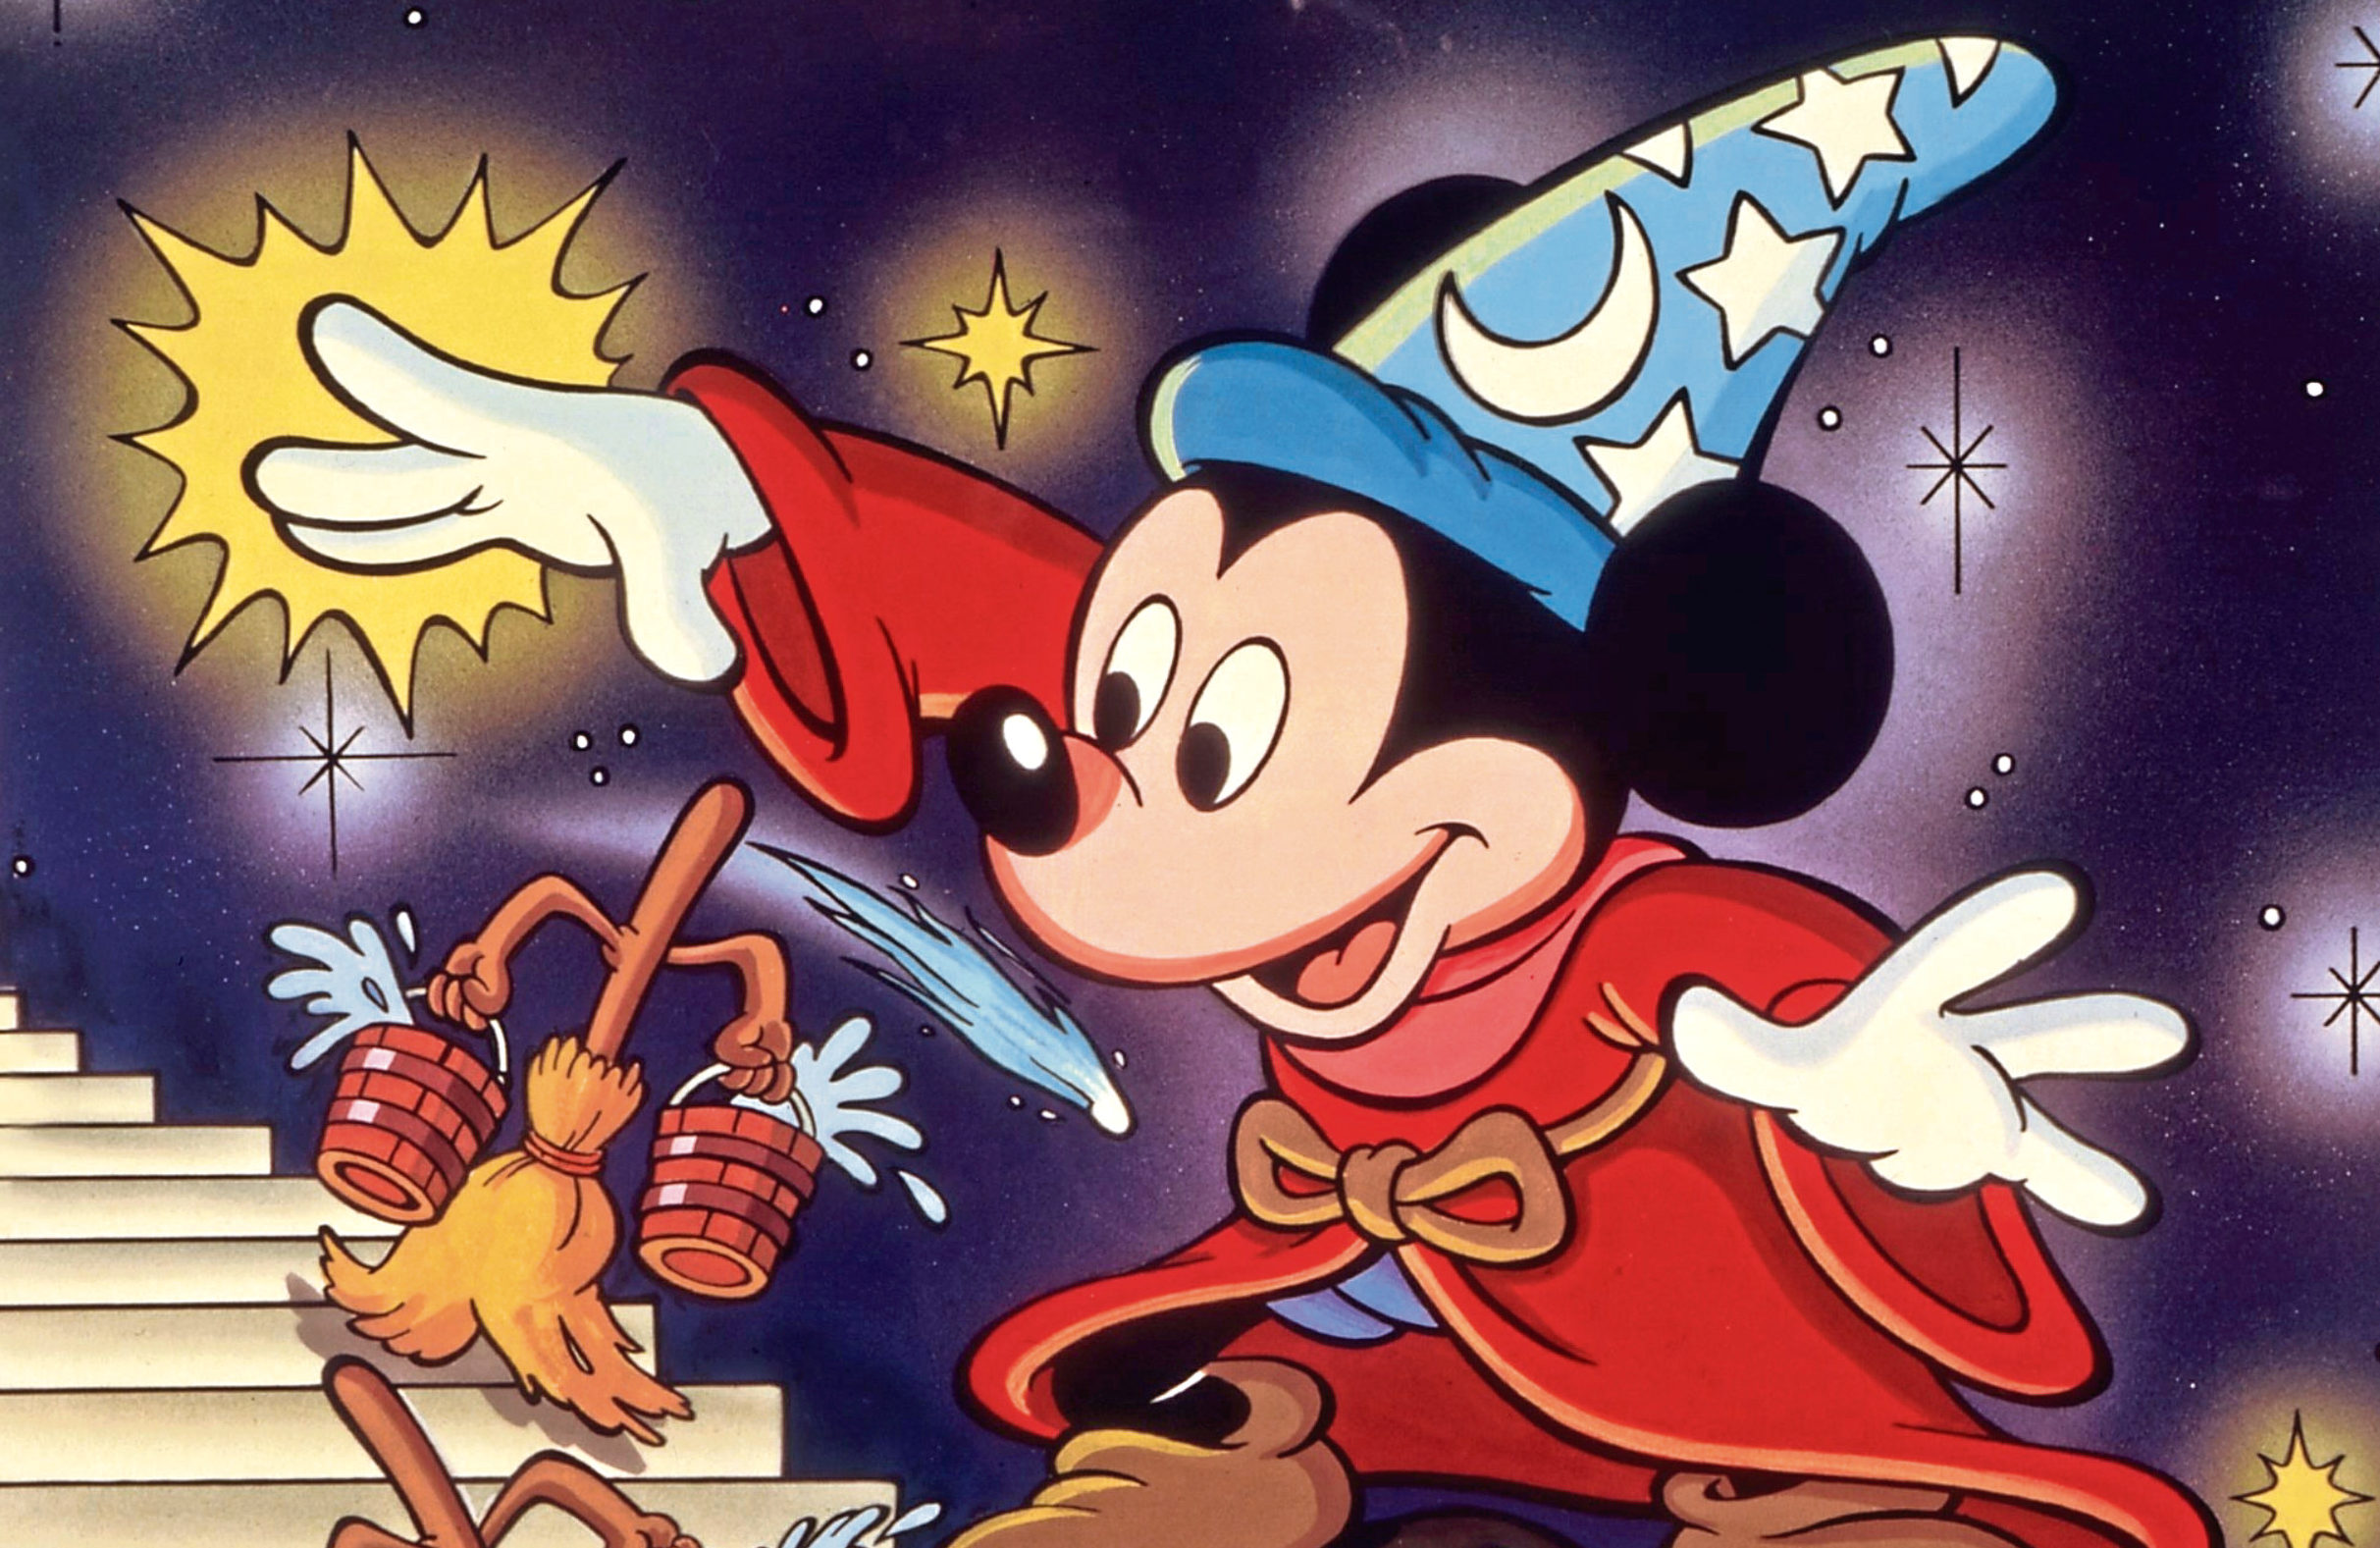 Mickey Mouse in Fantasia, 1940 (Allstar/DISNEY)